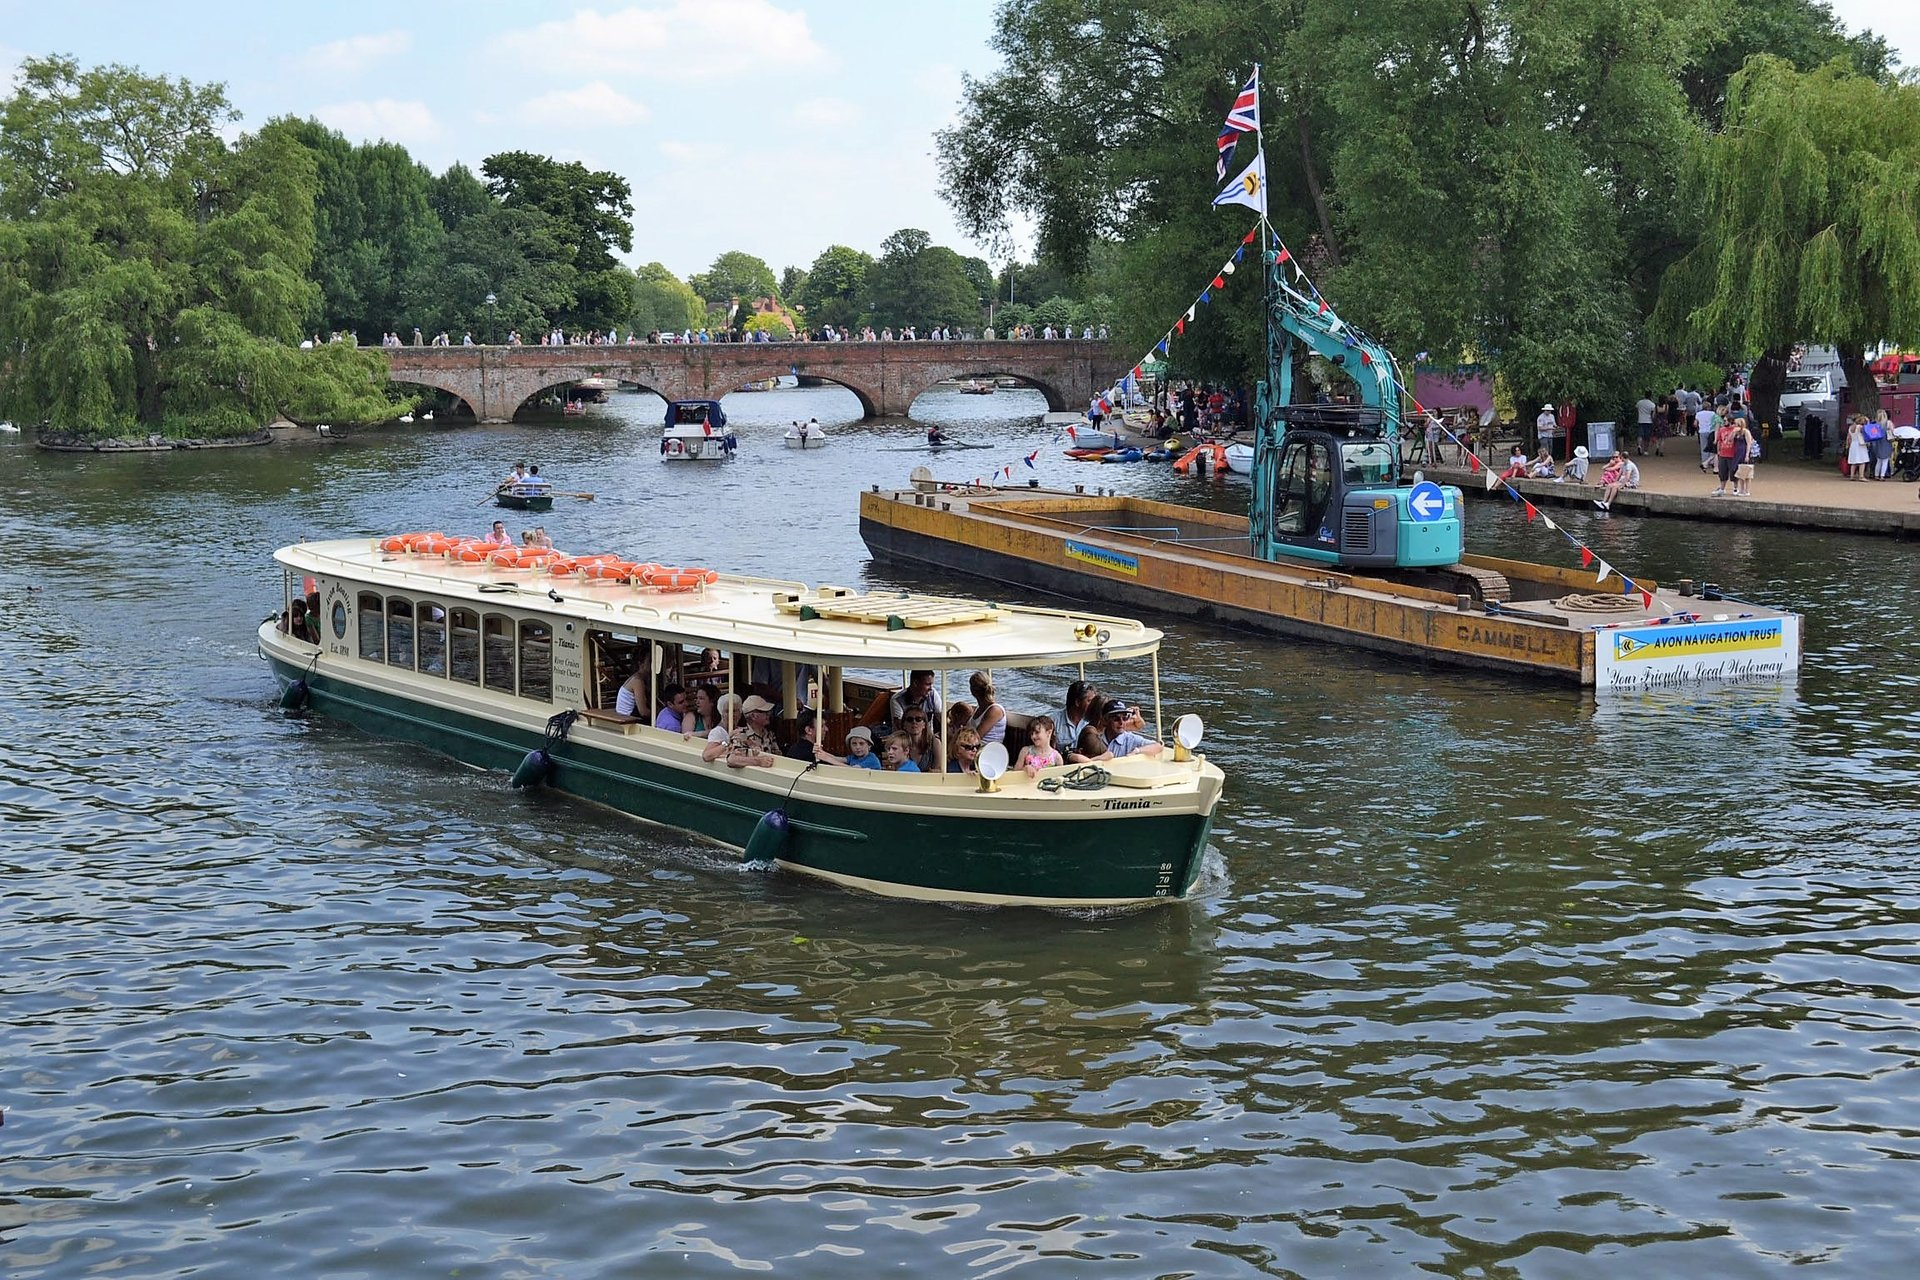 Best time for Stratford River Festival  in England 2019